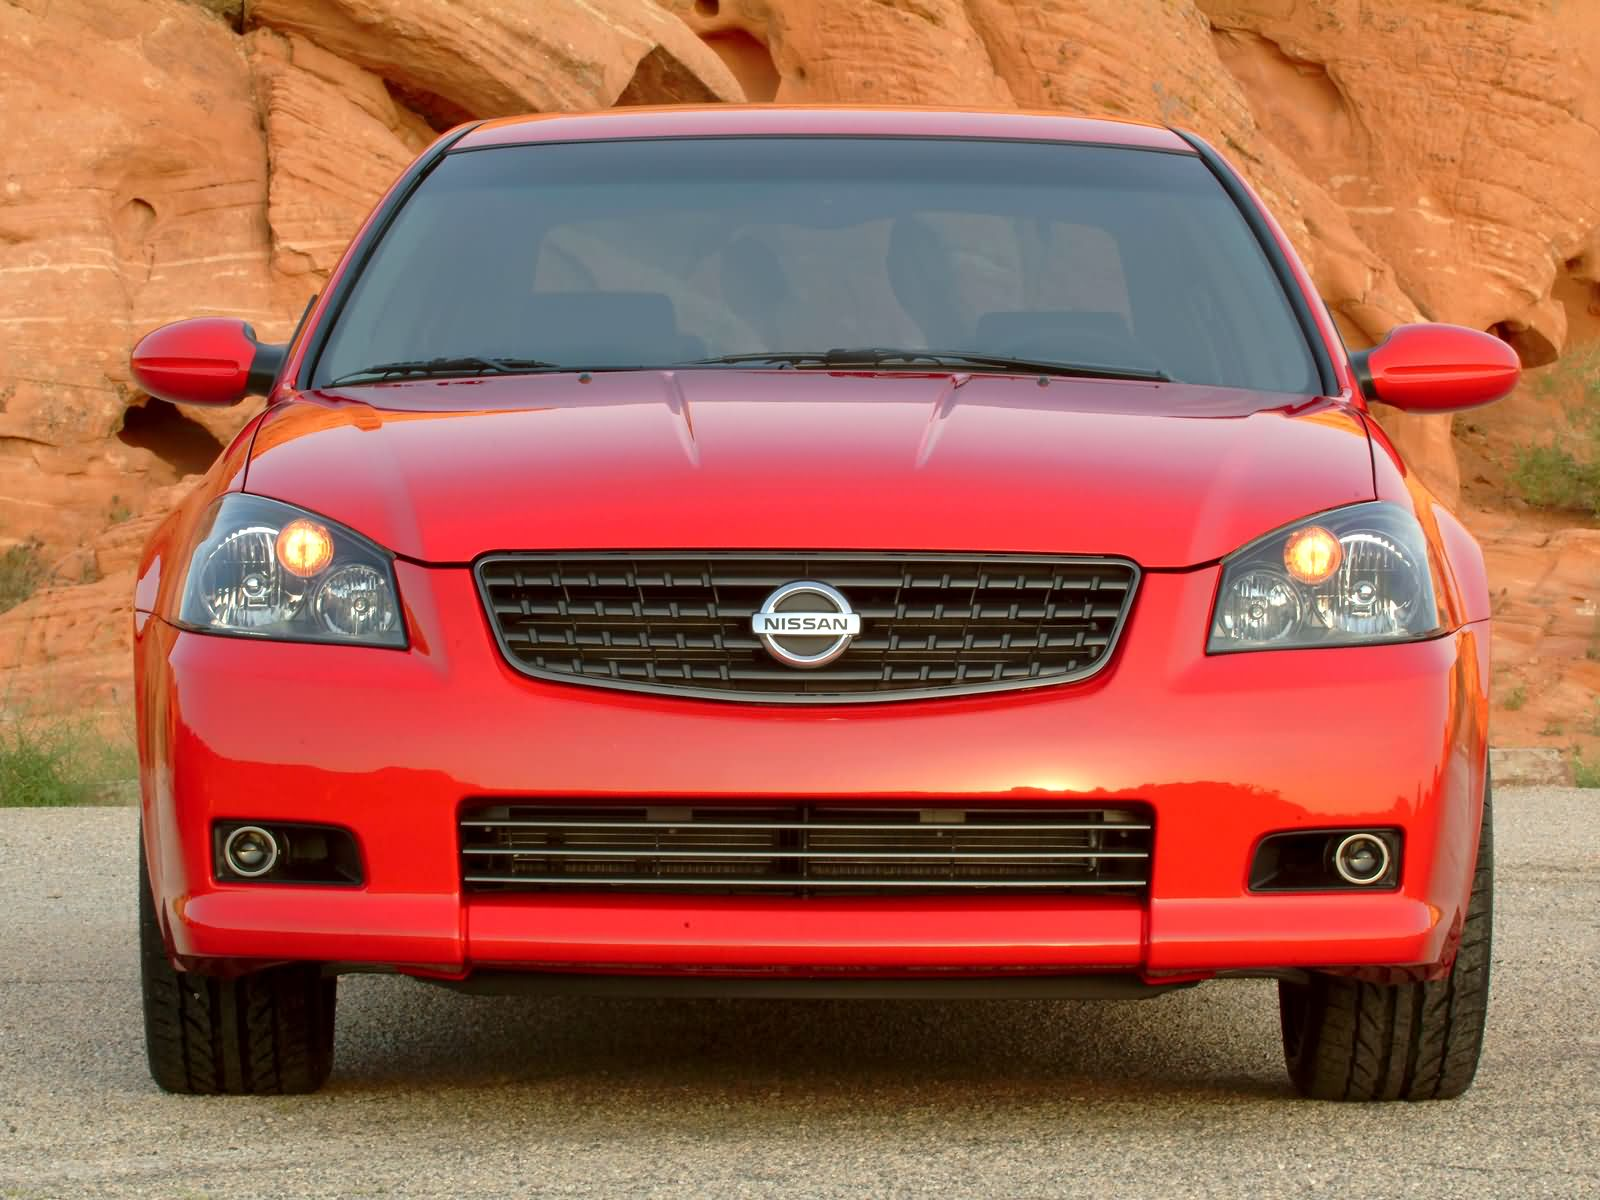 altima nissan 2006 2005 2002 se ser front cars autoevolution 2004